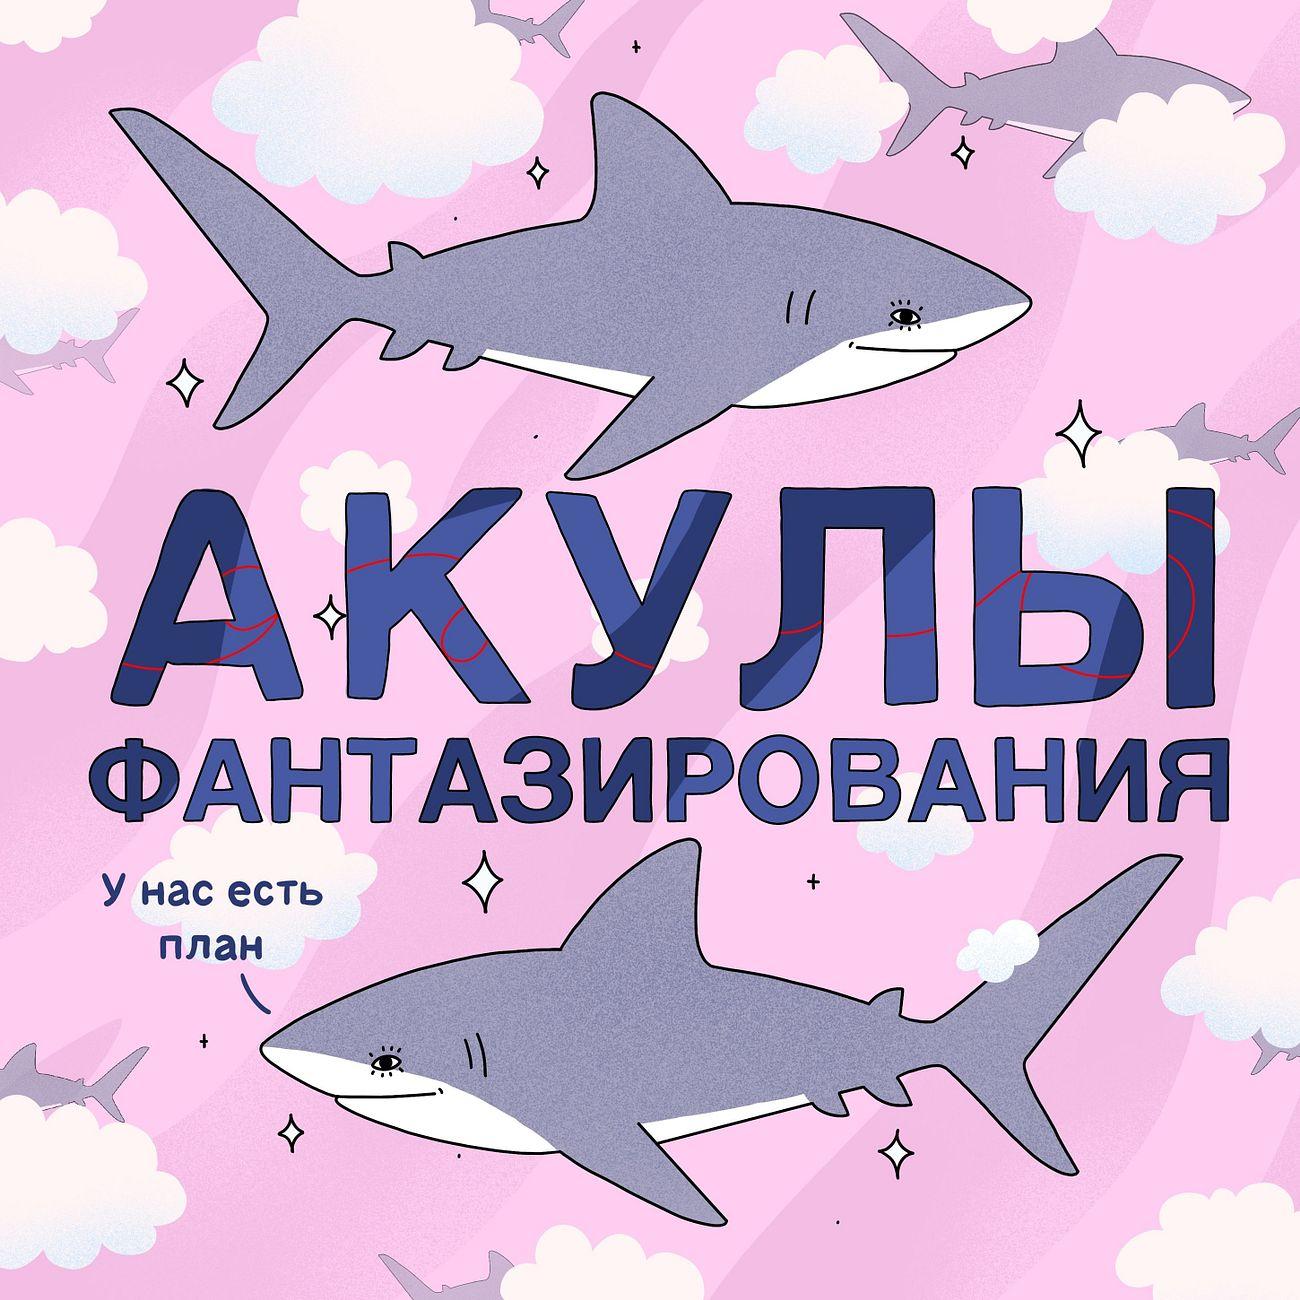 Акулы фантазирования